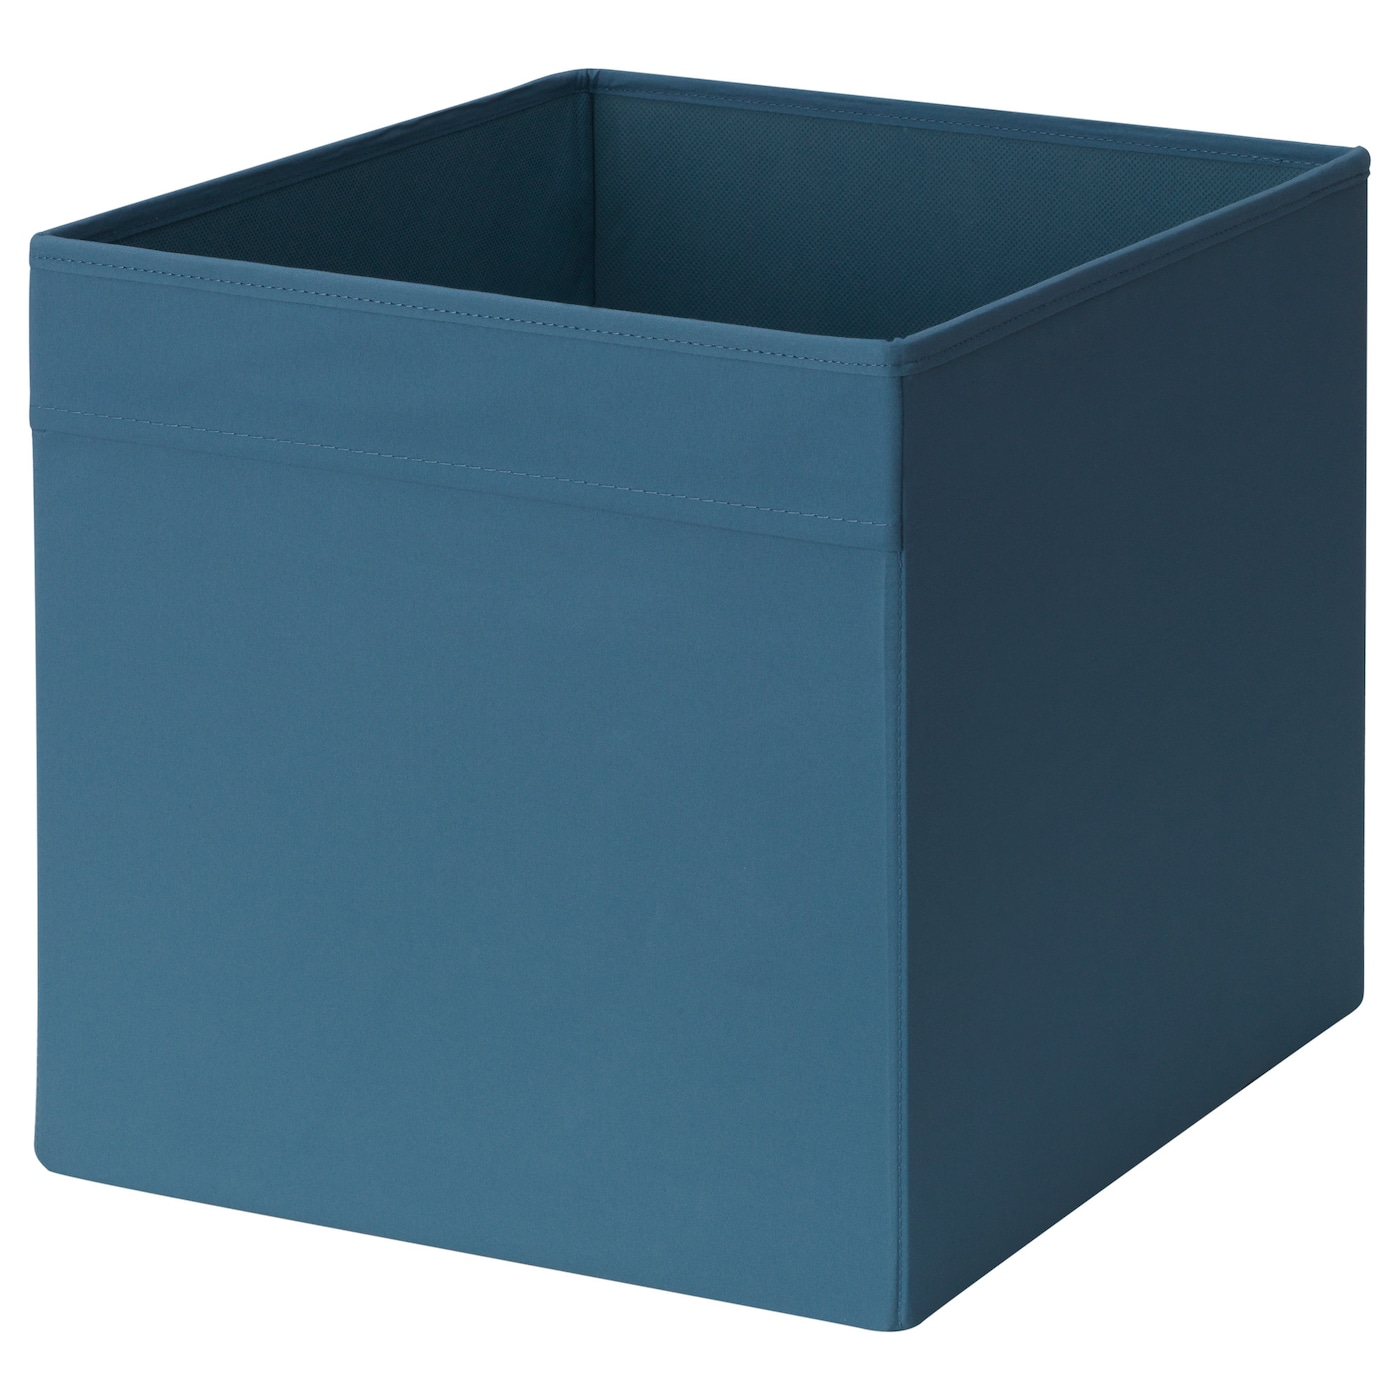 storage boxes baskets shop at ikea dublin ireland. Black Bedroom Furniture Sets. Home Design Ideas